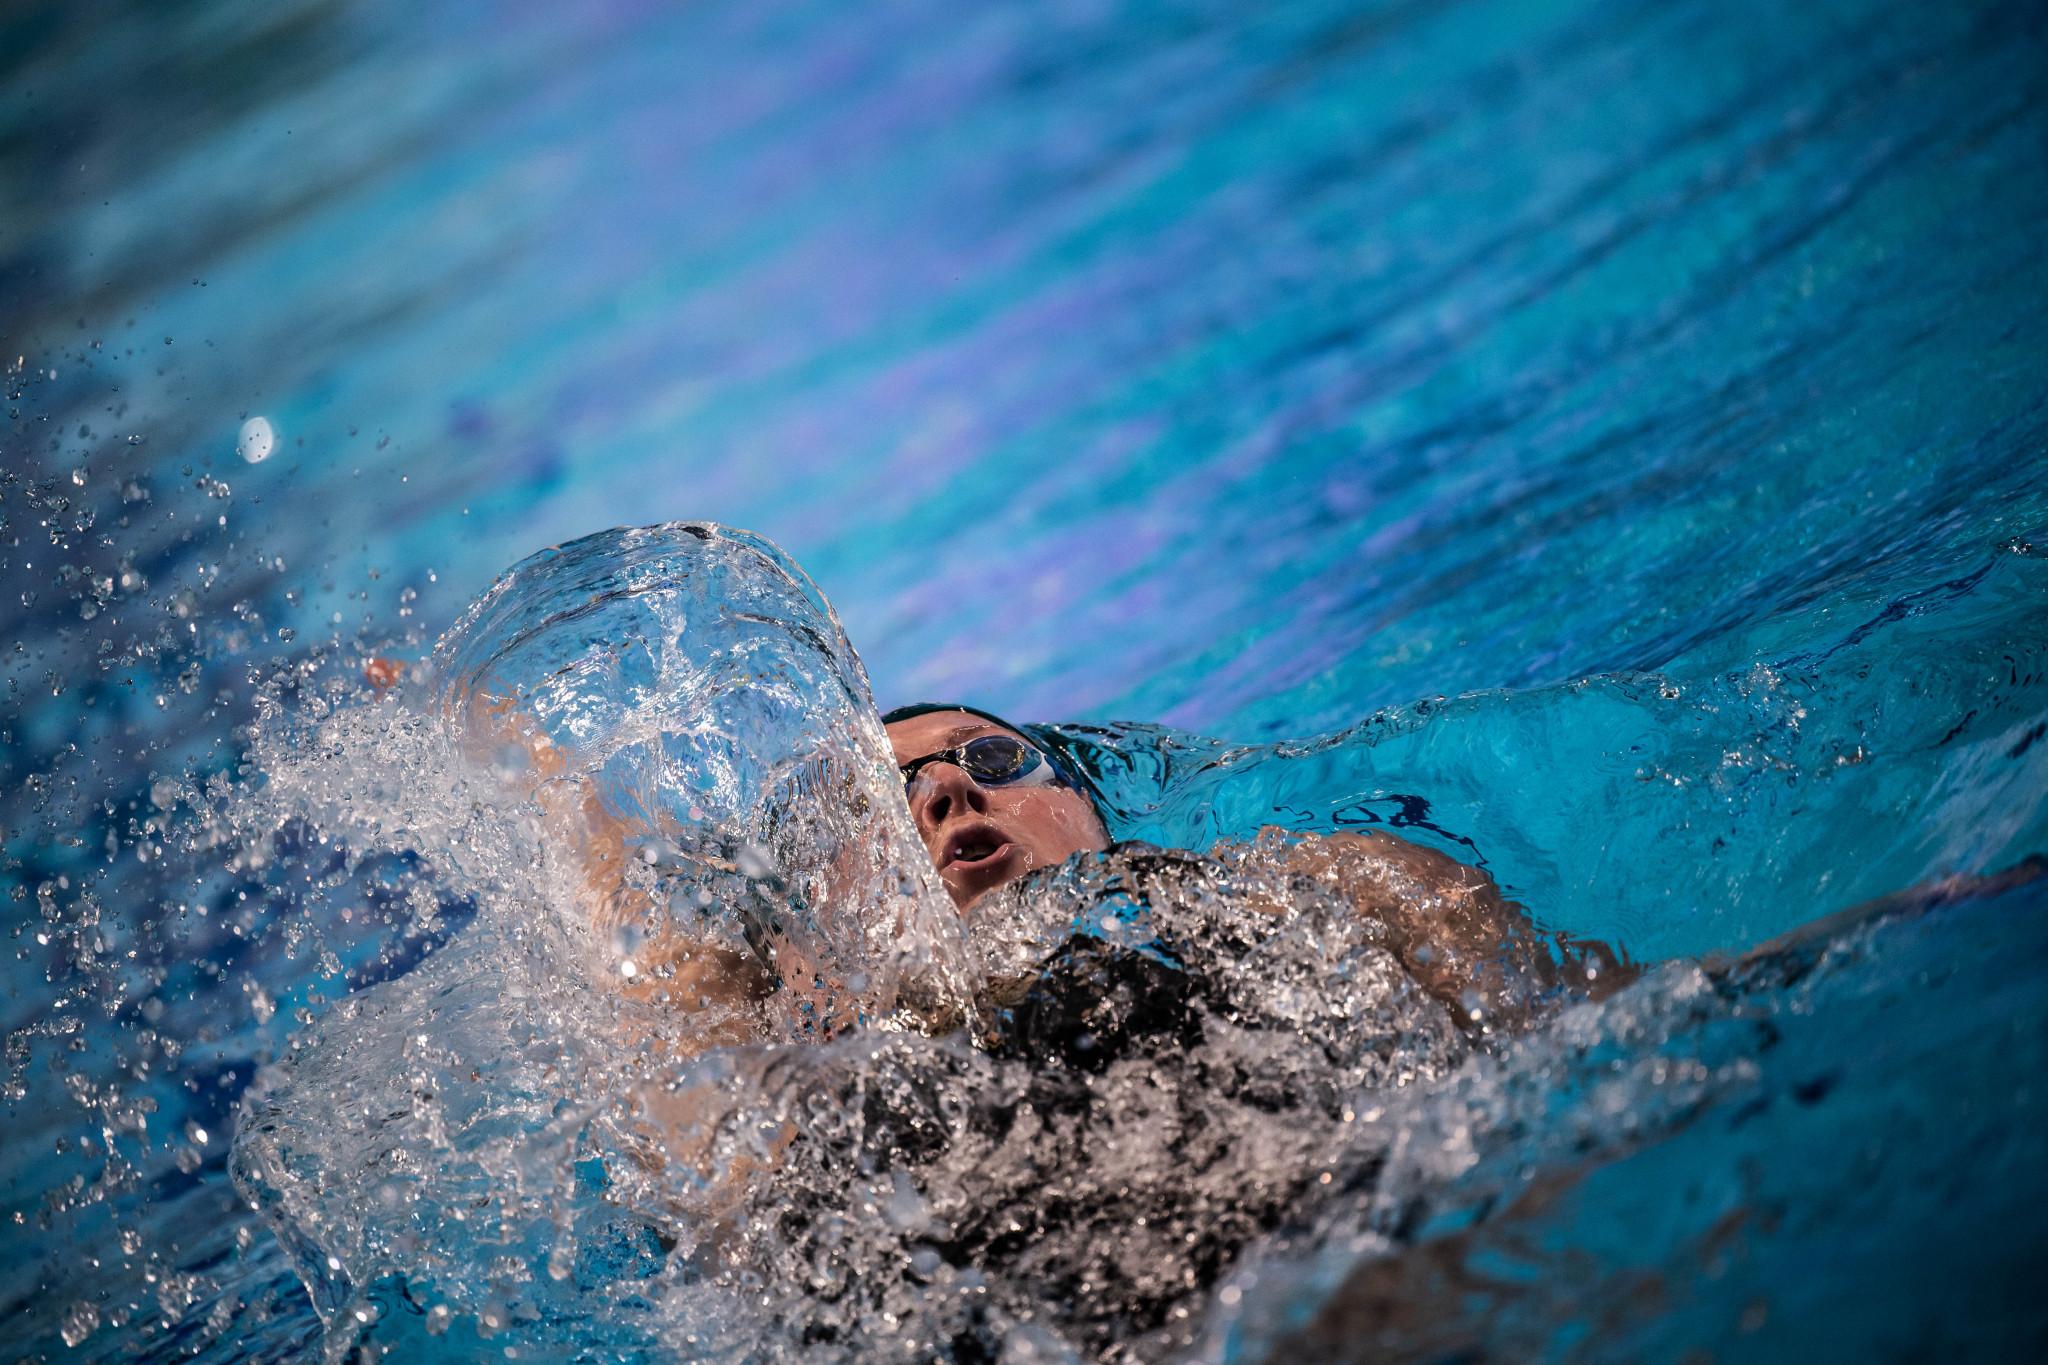 Toussaint breaks 50m backstroke world record as London Roar and Energy Standard dominate first ISL semi-final